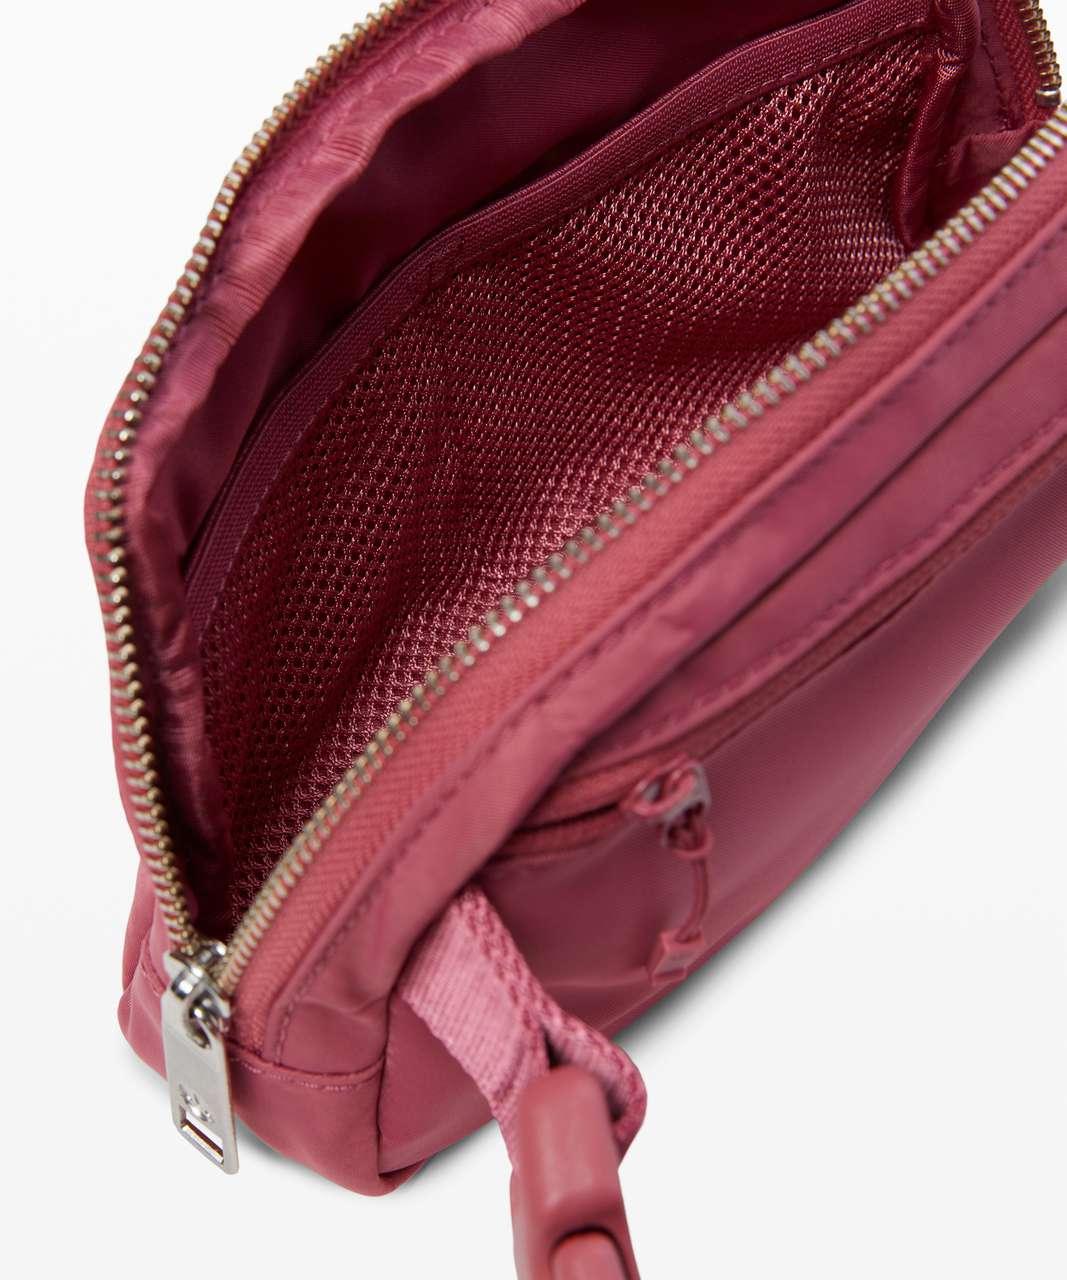 Lululemon Everywhere Belt Bag *1L - Cherry Tint